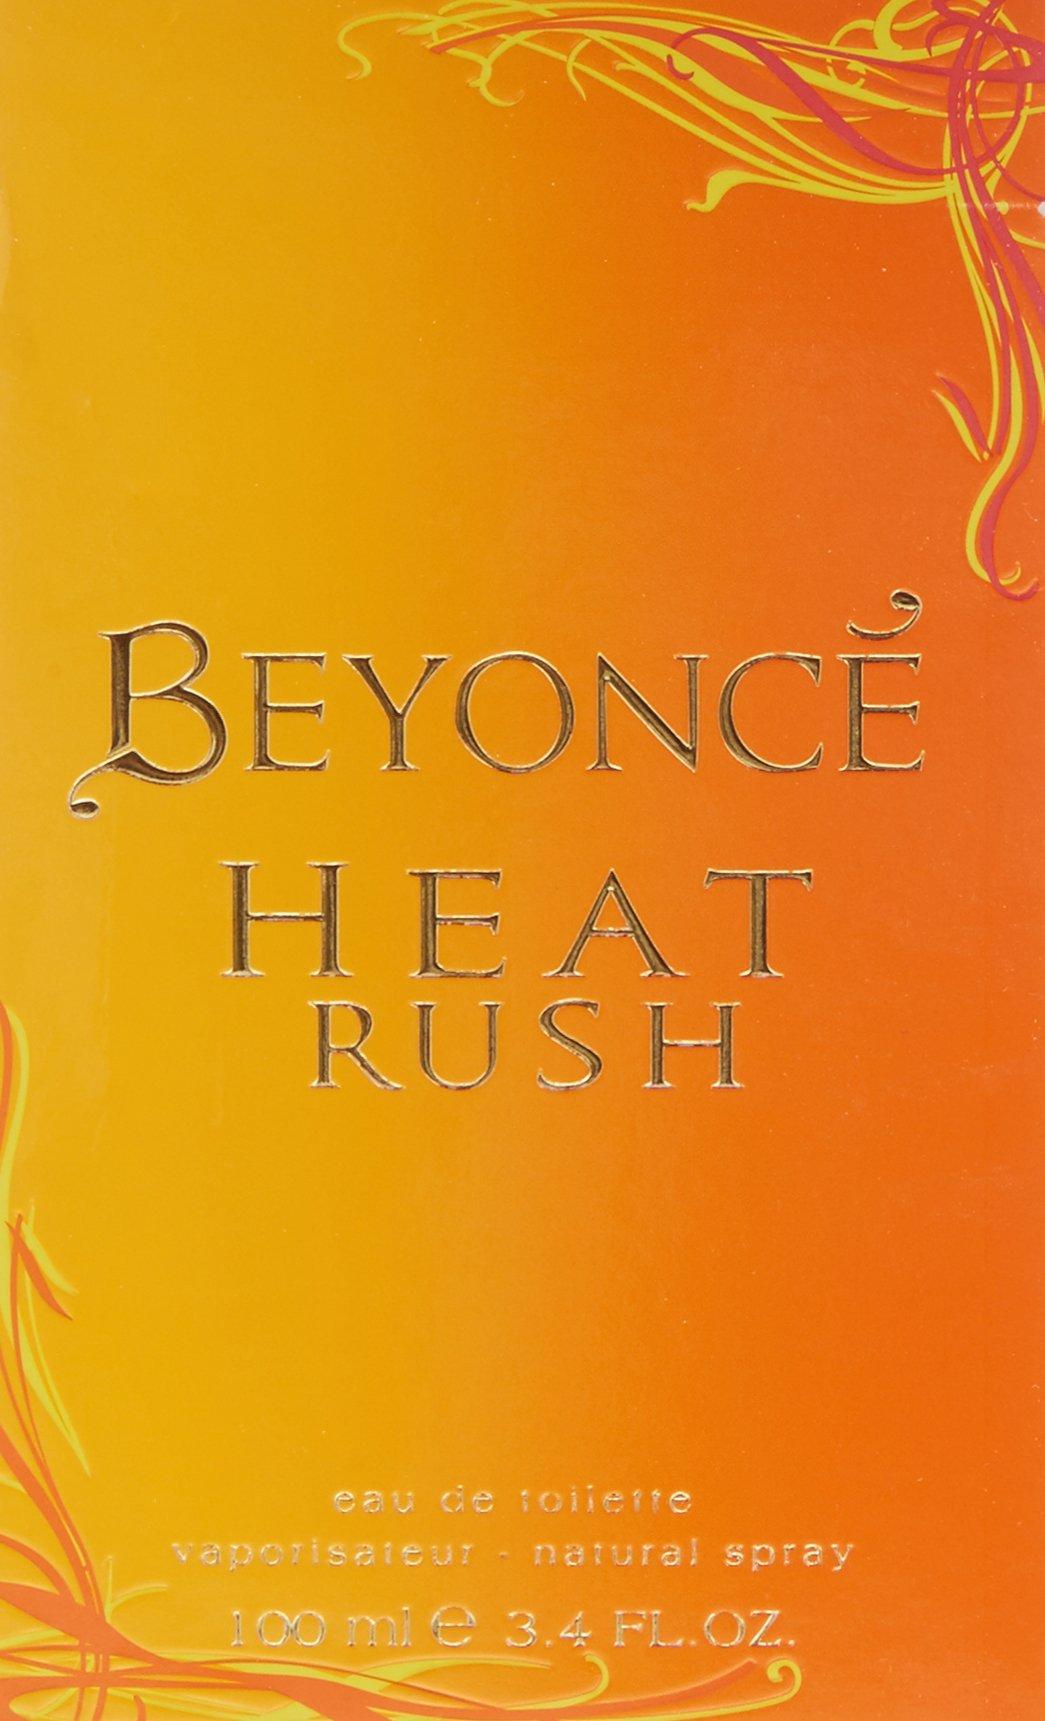 Beyonce Heat Rush by Beyonce, Eau De Toilette Spray, 3.4 Ounce by Beyonce (Image #2)